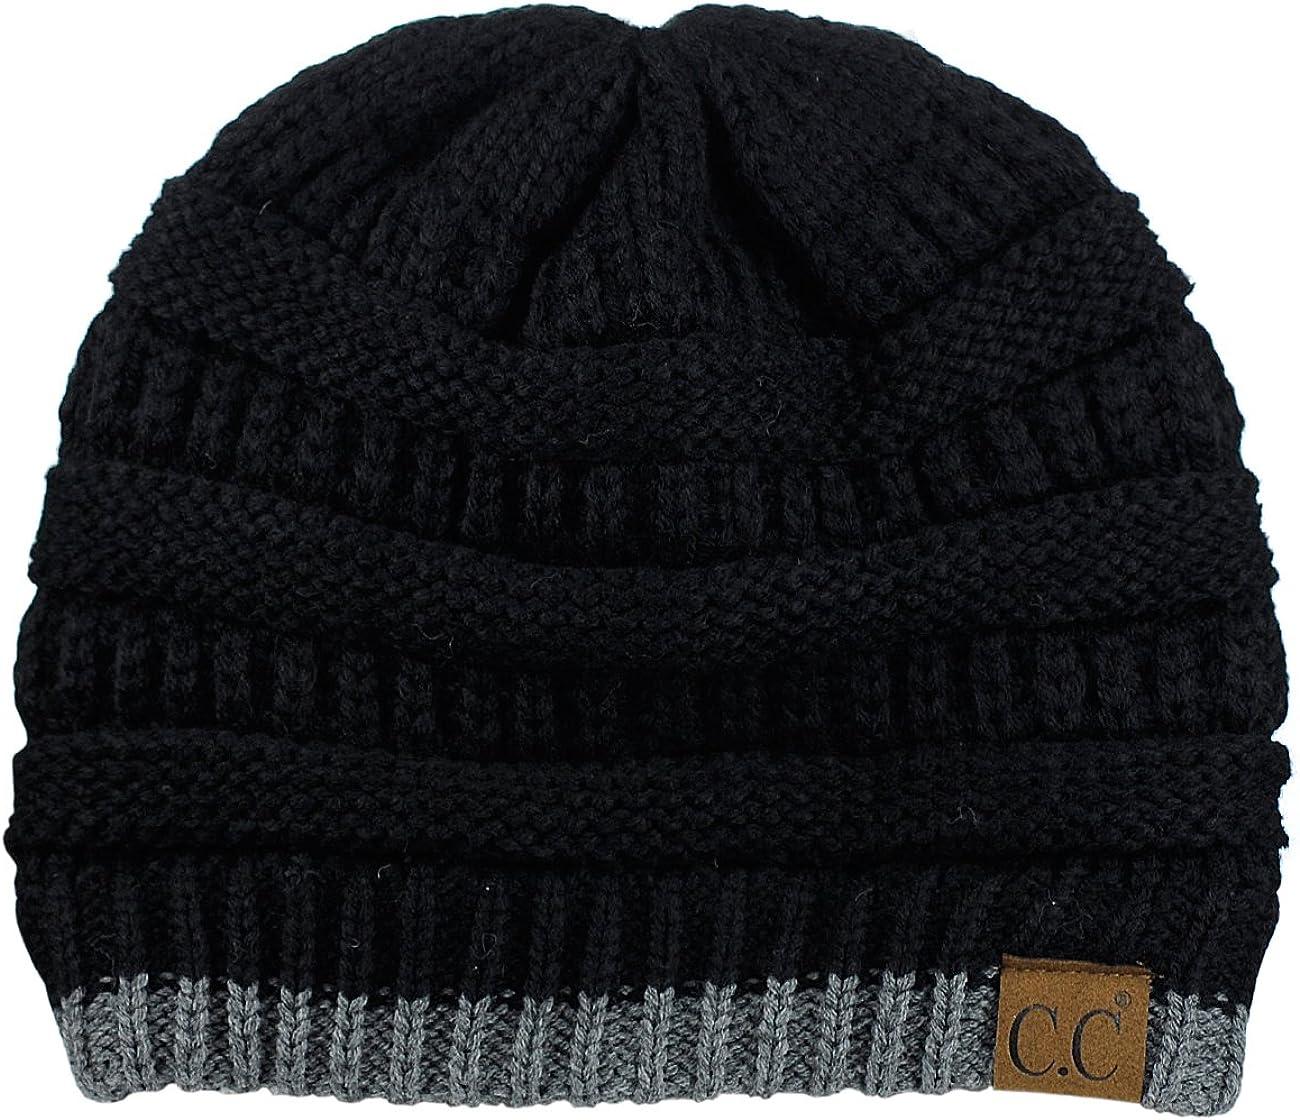 C.C Trendy Warm Chunky Soft Stretch Cable Knit Beanie Skully, Black/Dk Mel Gray